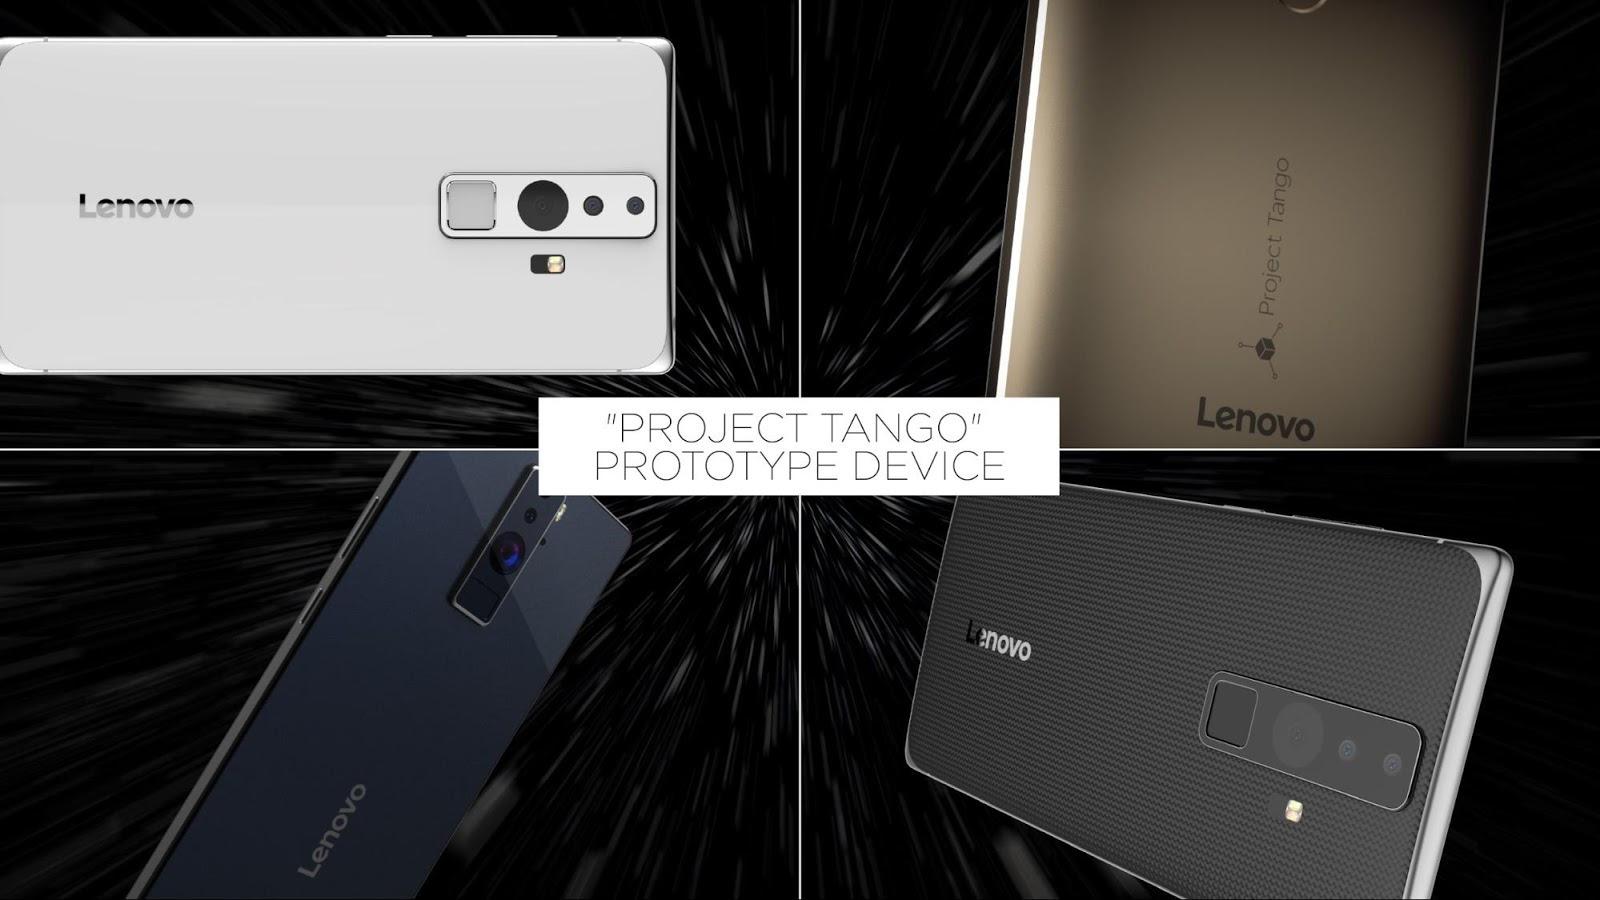 Prototypy smartfonów z Projektu Tango - fot. mat. pras.